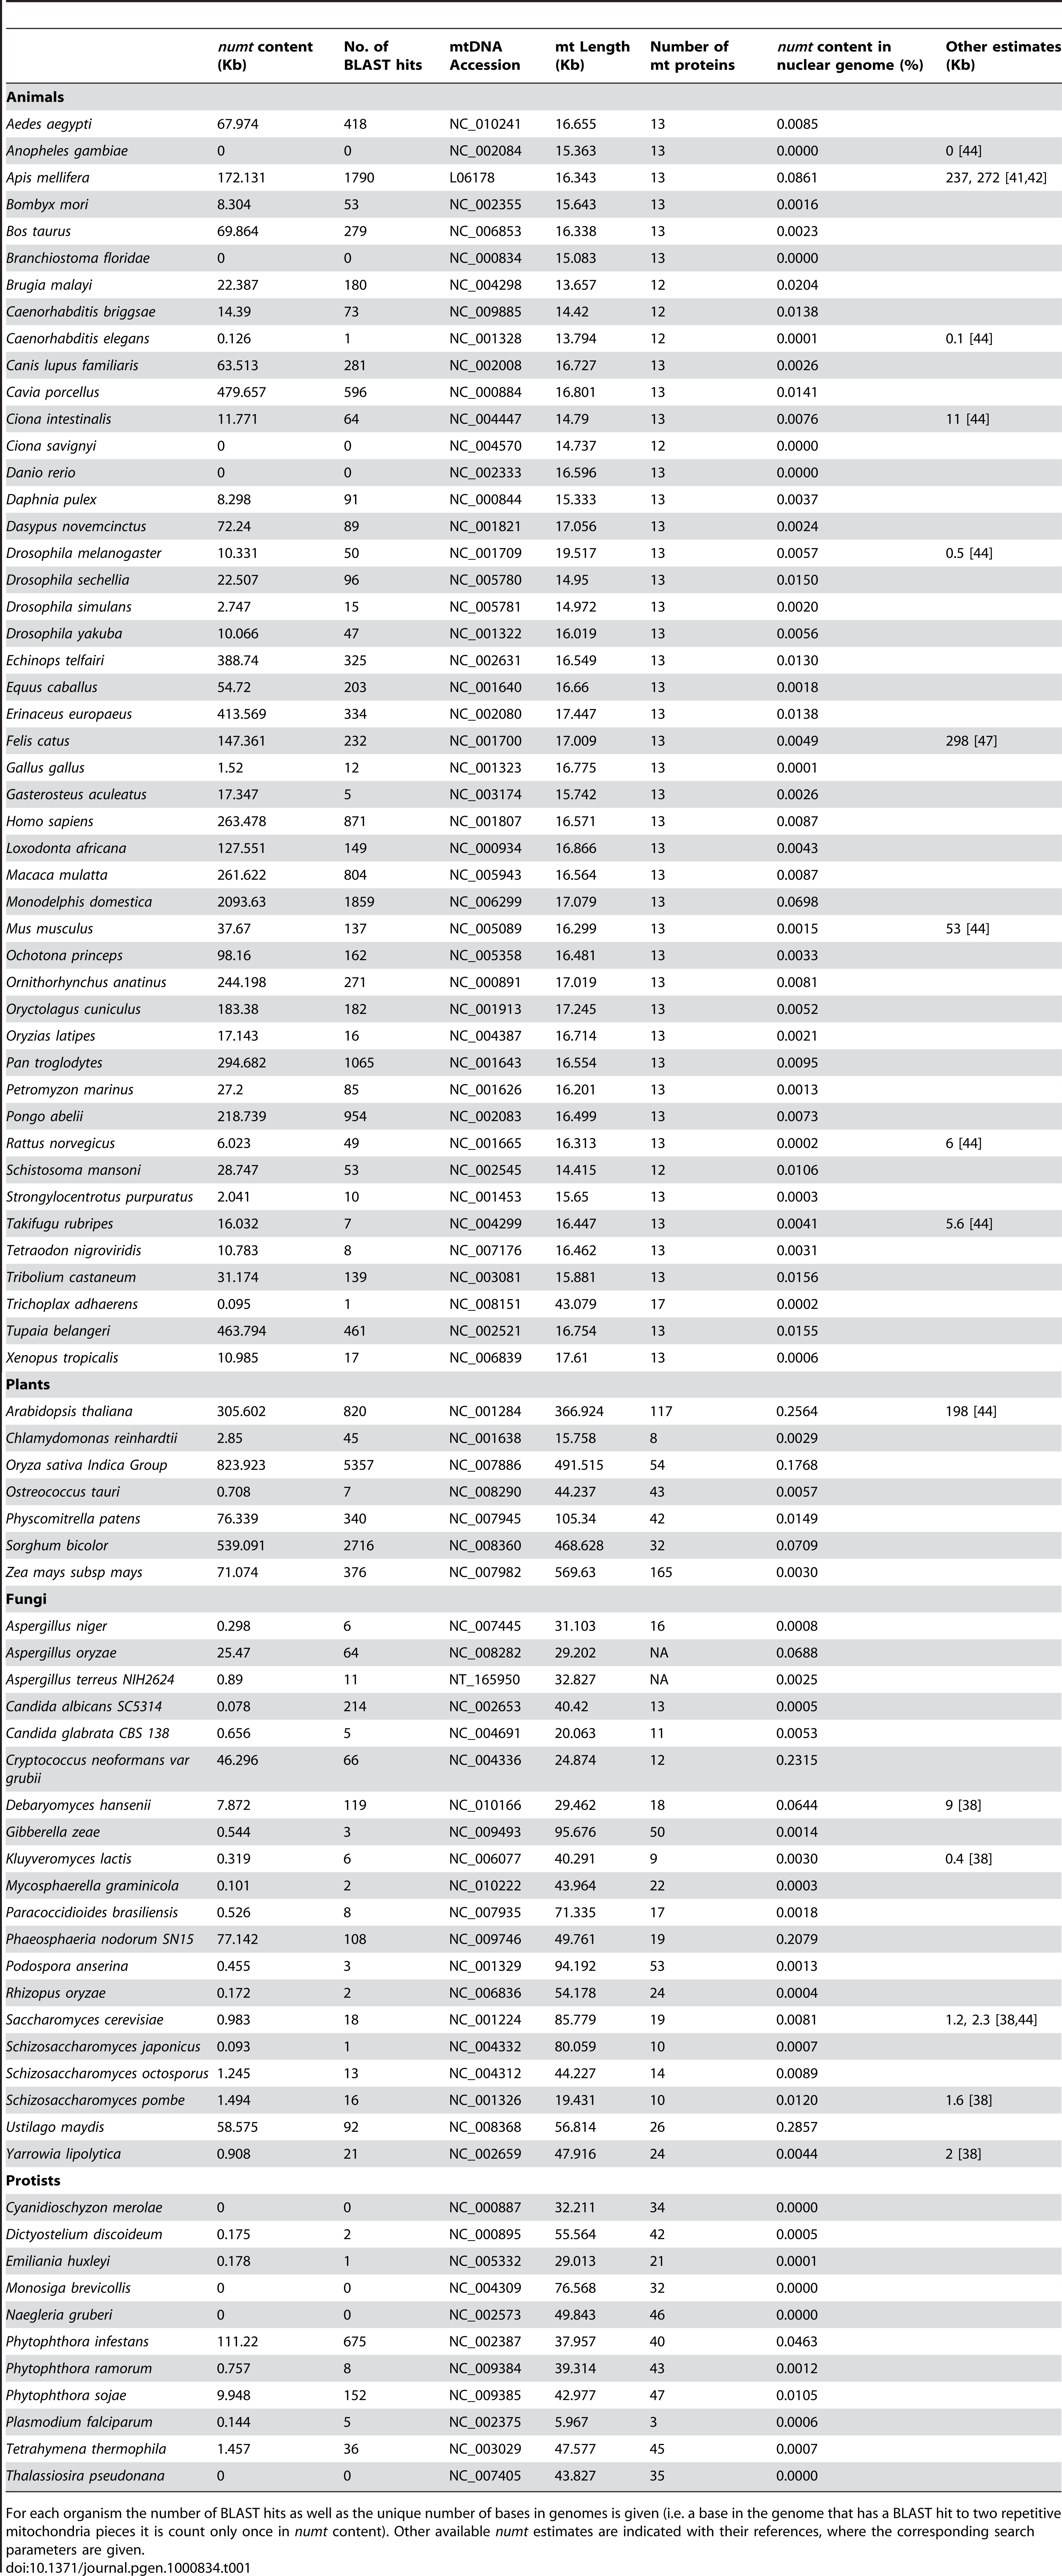 Blast analysis of 85 mitochondria against their nuclear genomes (BlastN, e-score=0.0001).